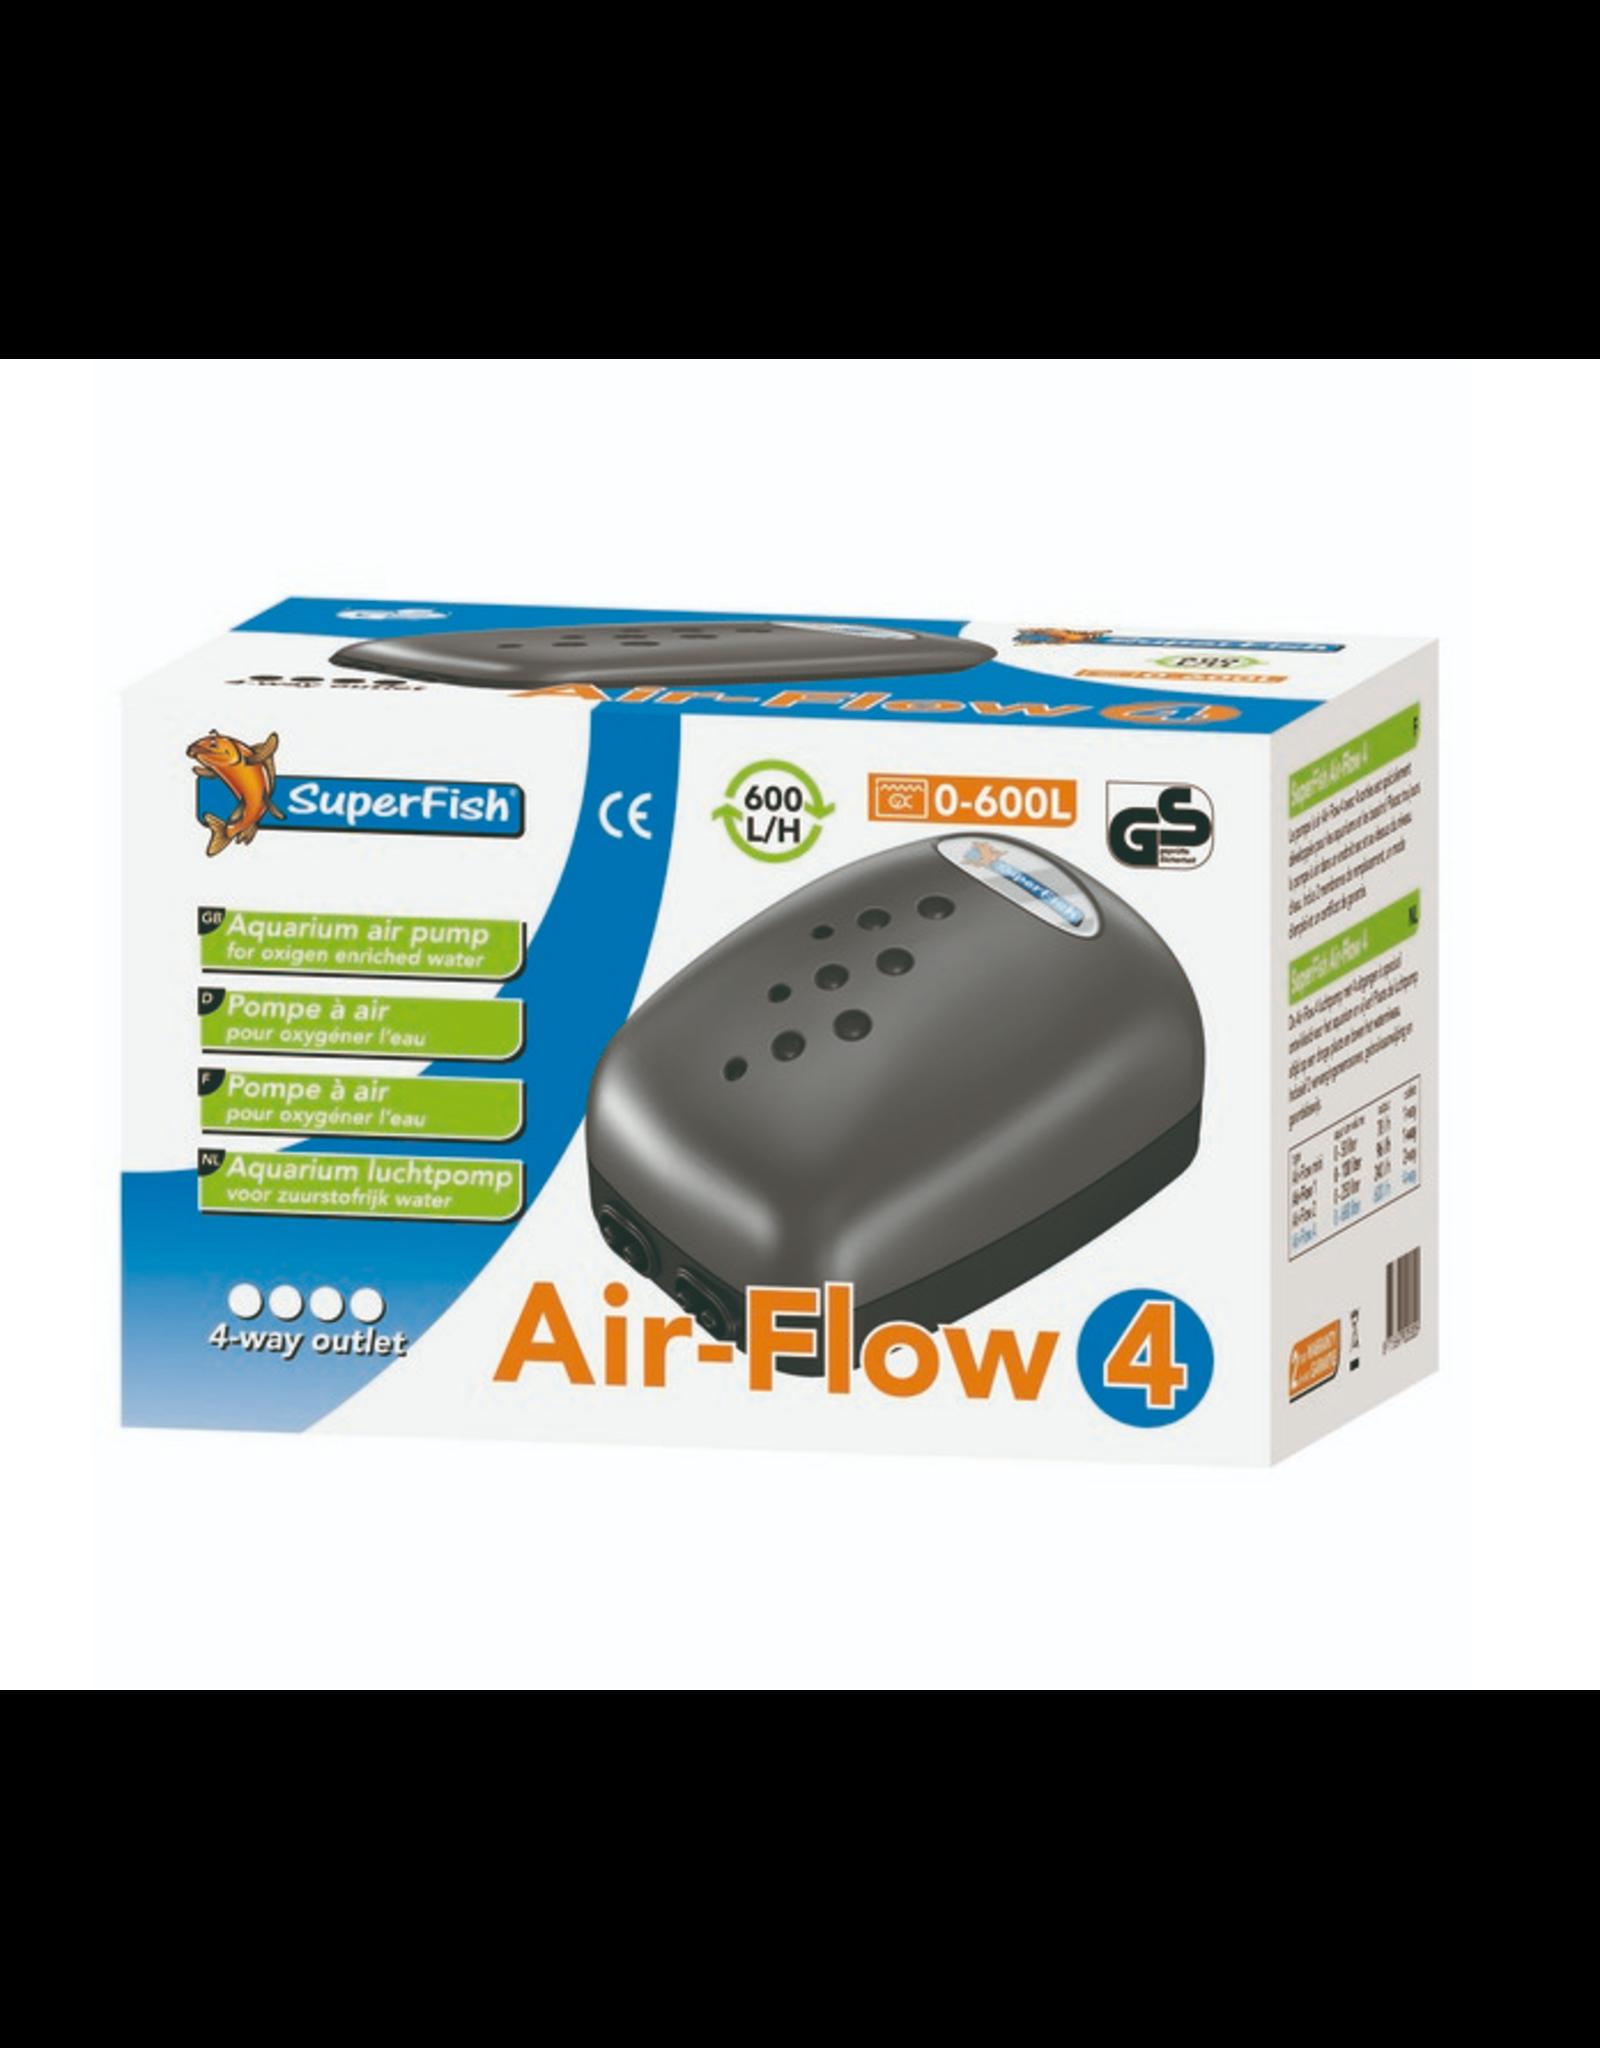 SuperFish SuperFish Air Flow 4 0-600L